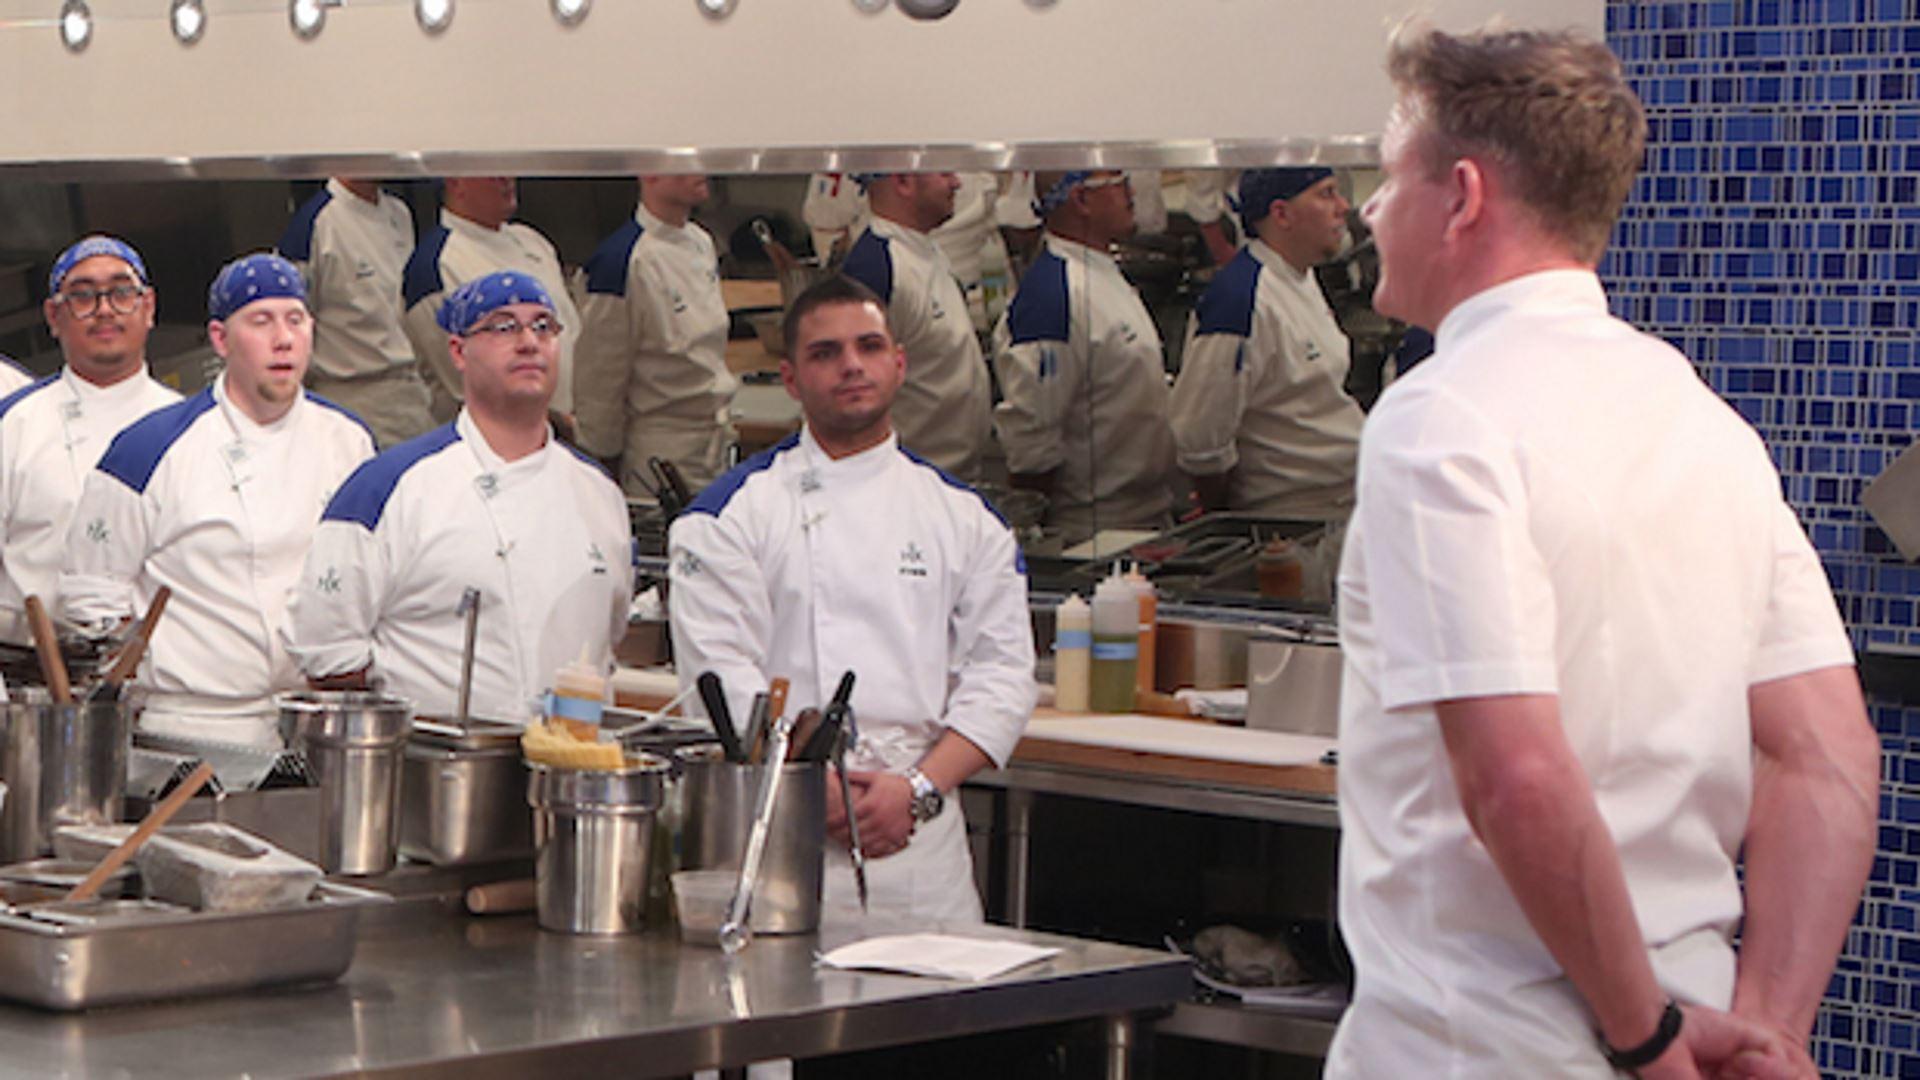 Miraculous Hells Kitchen Season 15 Watch Free On 123Movies Home Interior And Landscaping Analalmasignezvosmurscom